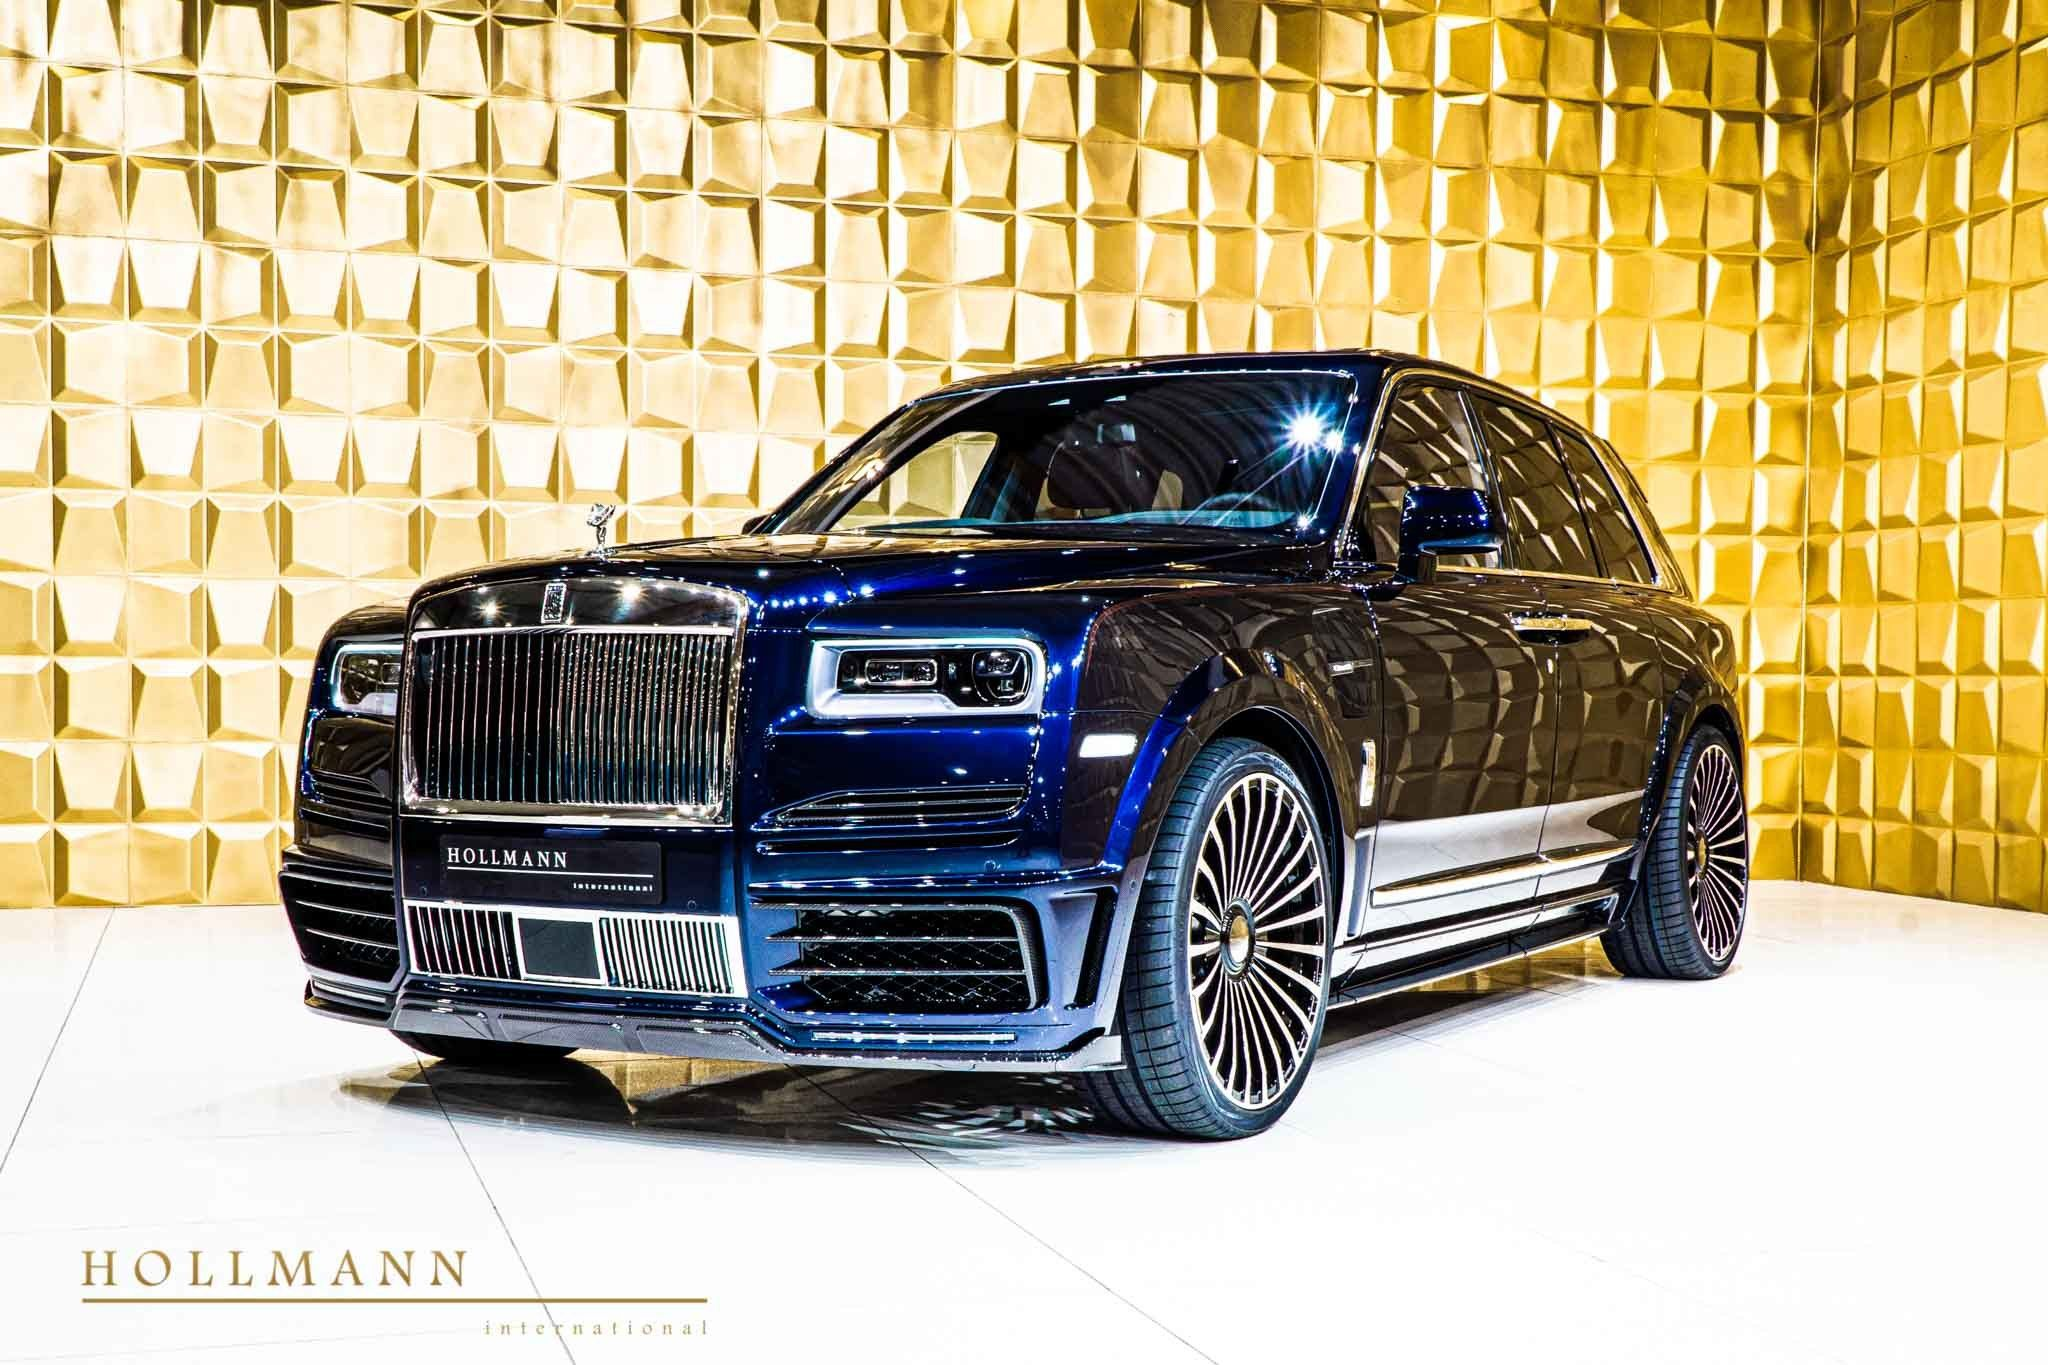 Rolls-Royce Cullinan by Mansory – Hollmann  – Luxury Pulse Cars – Germany